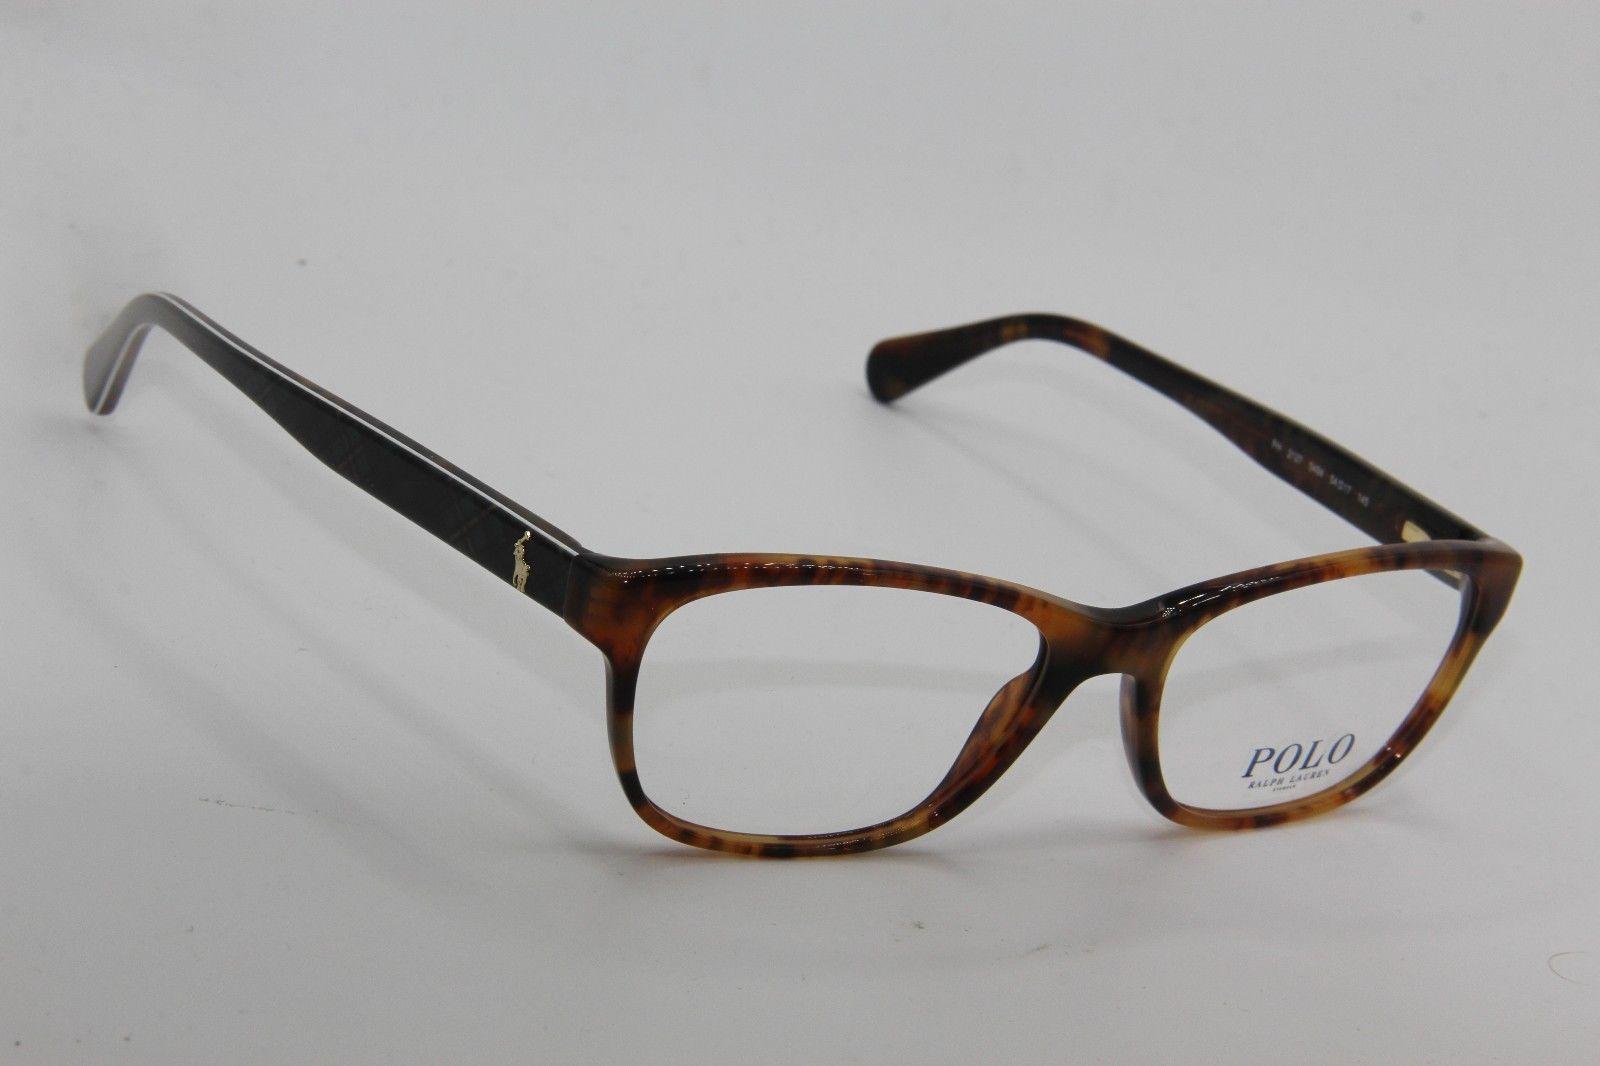 Havana Polo Lauren Ph 50 2127 New Items And Similar 5494 Ralph JFT13Kcul